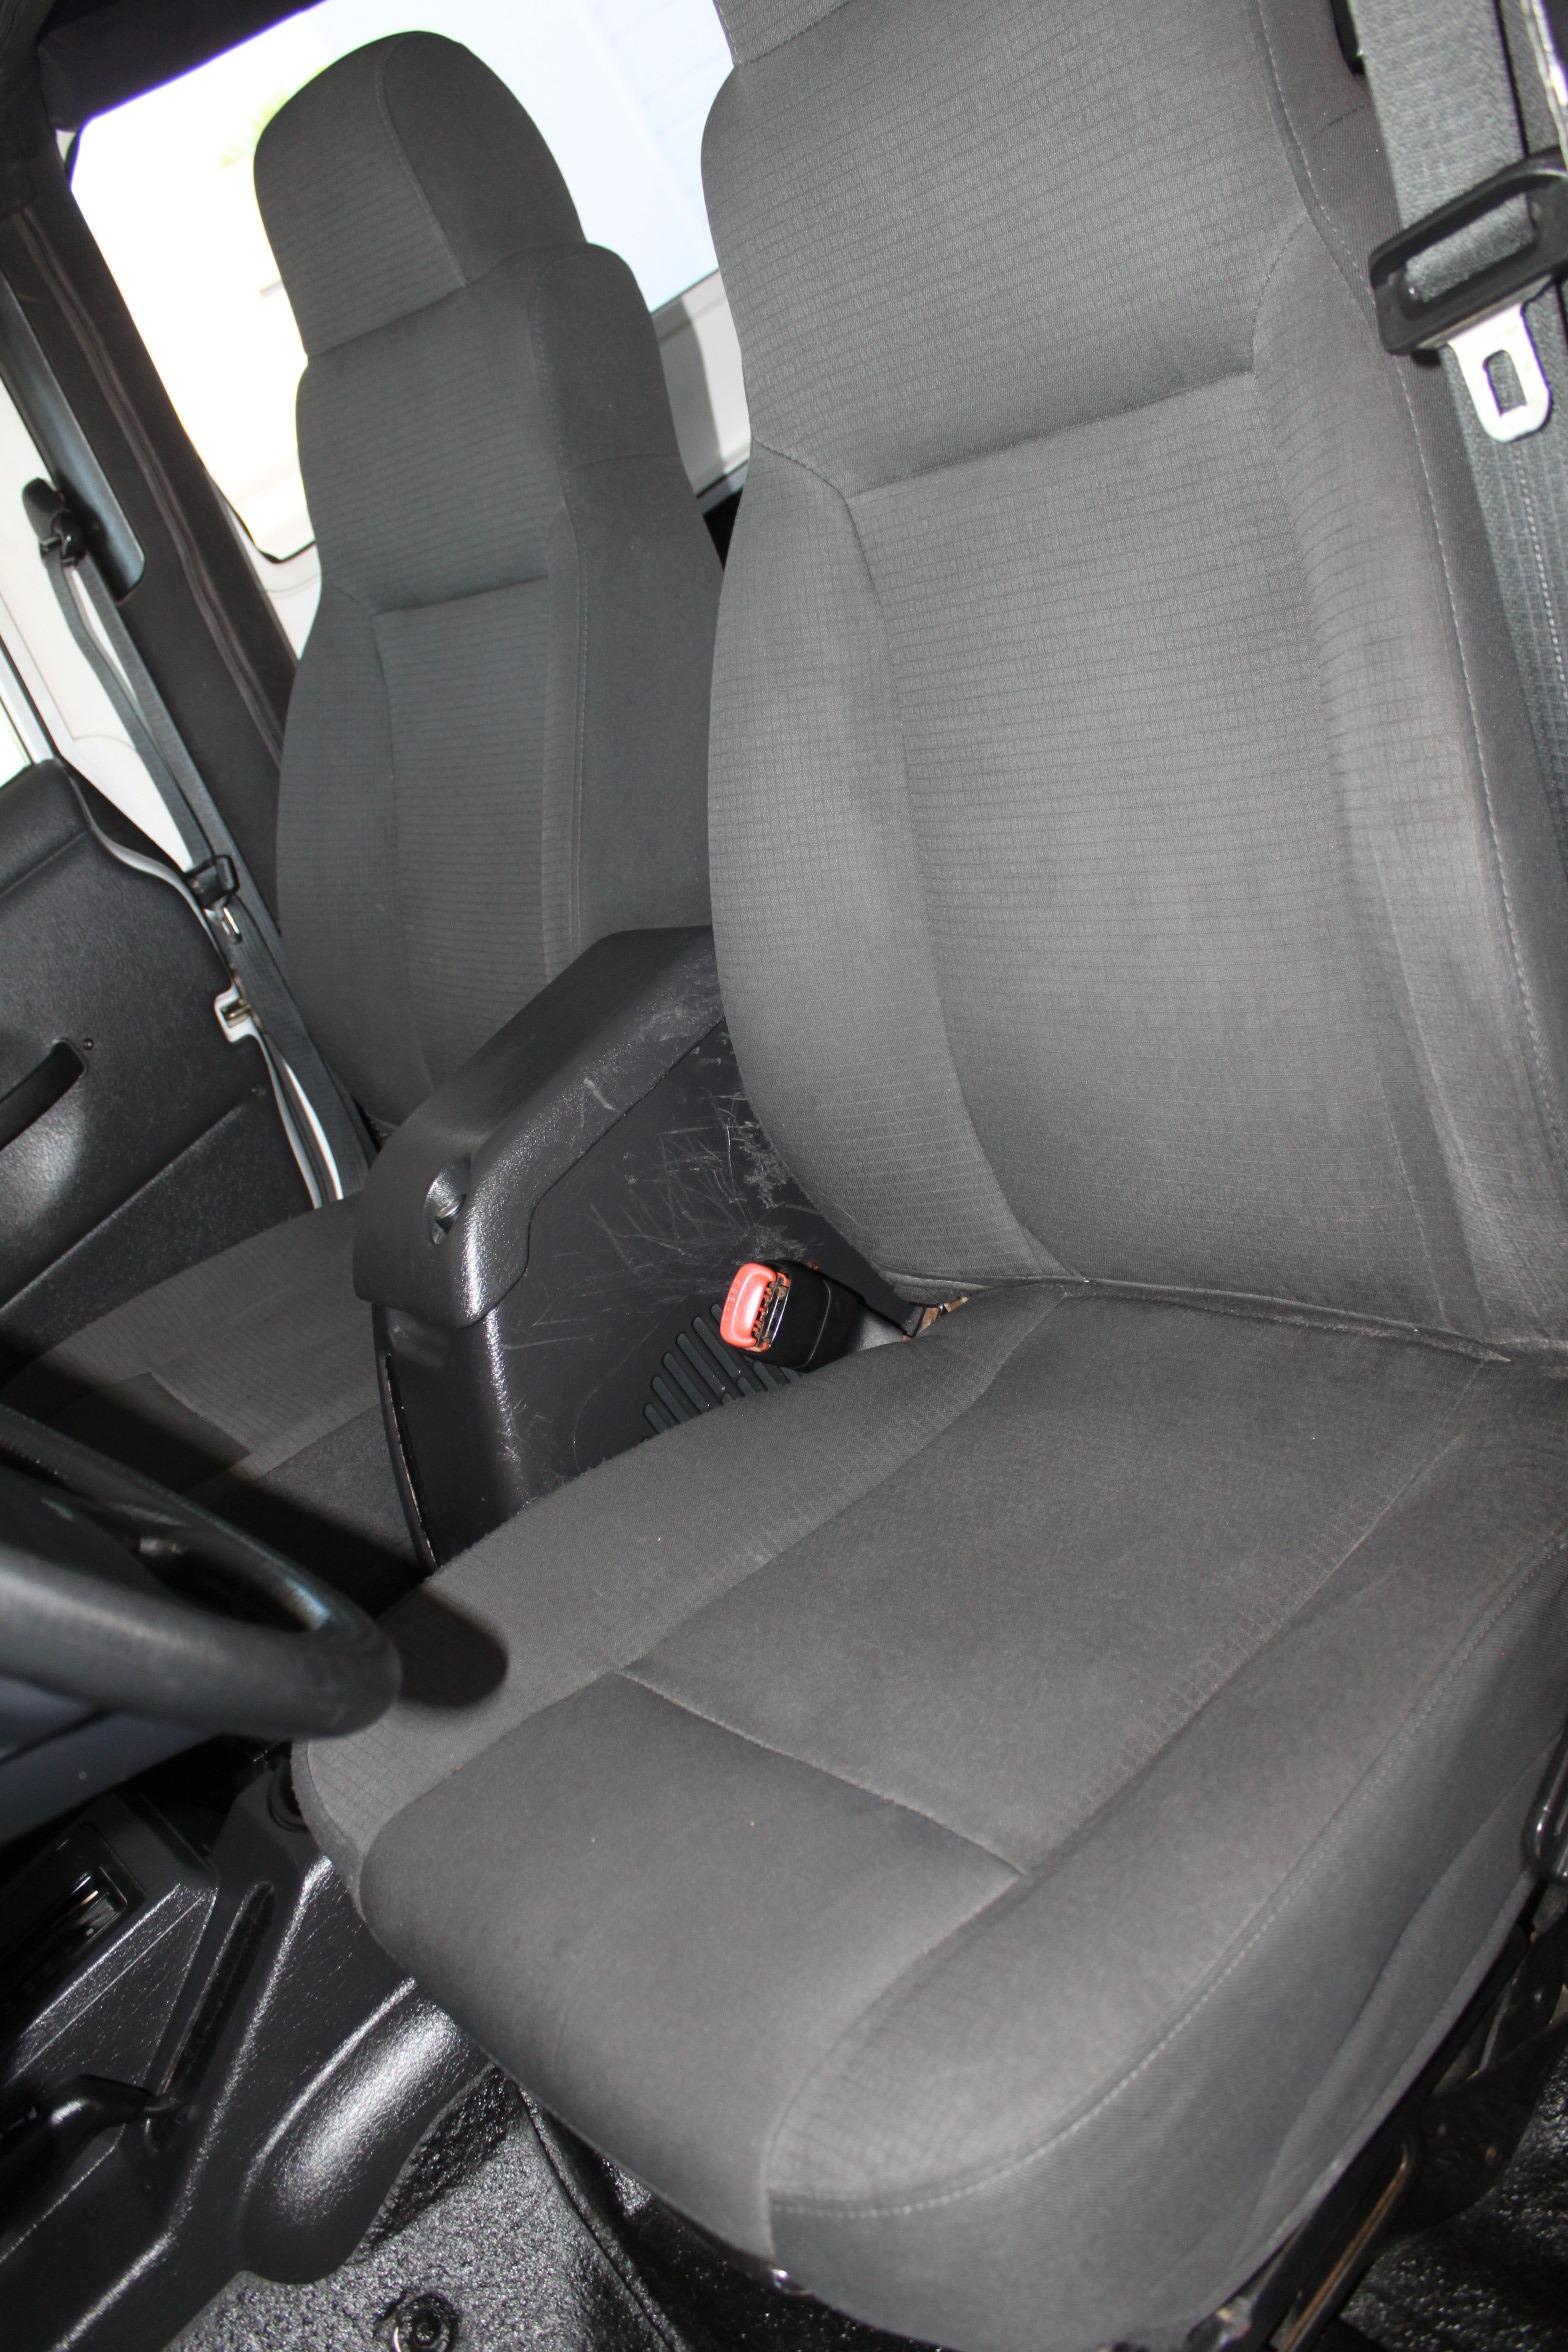 Used-2006-Jeep-Wrangler-Unlimited-LWB-Land-Cruiser